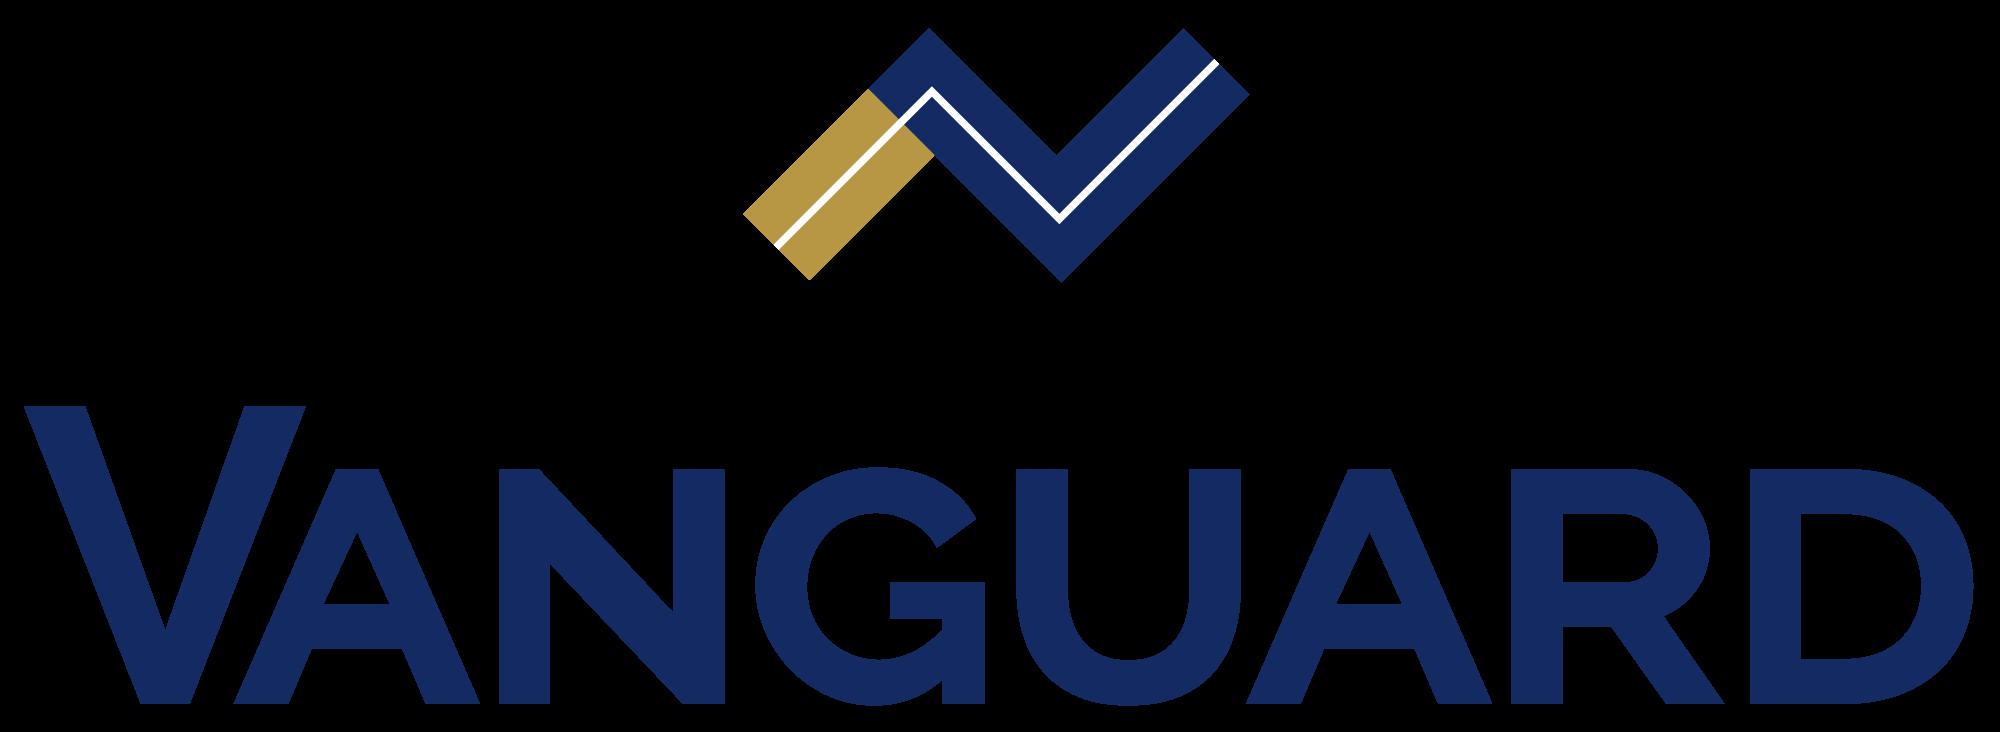 Vangaurd_Logo_Stacked_Color